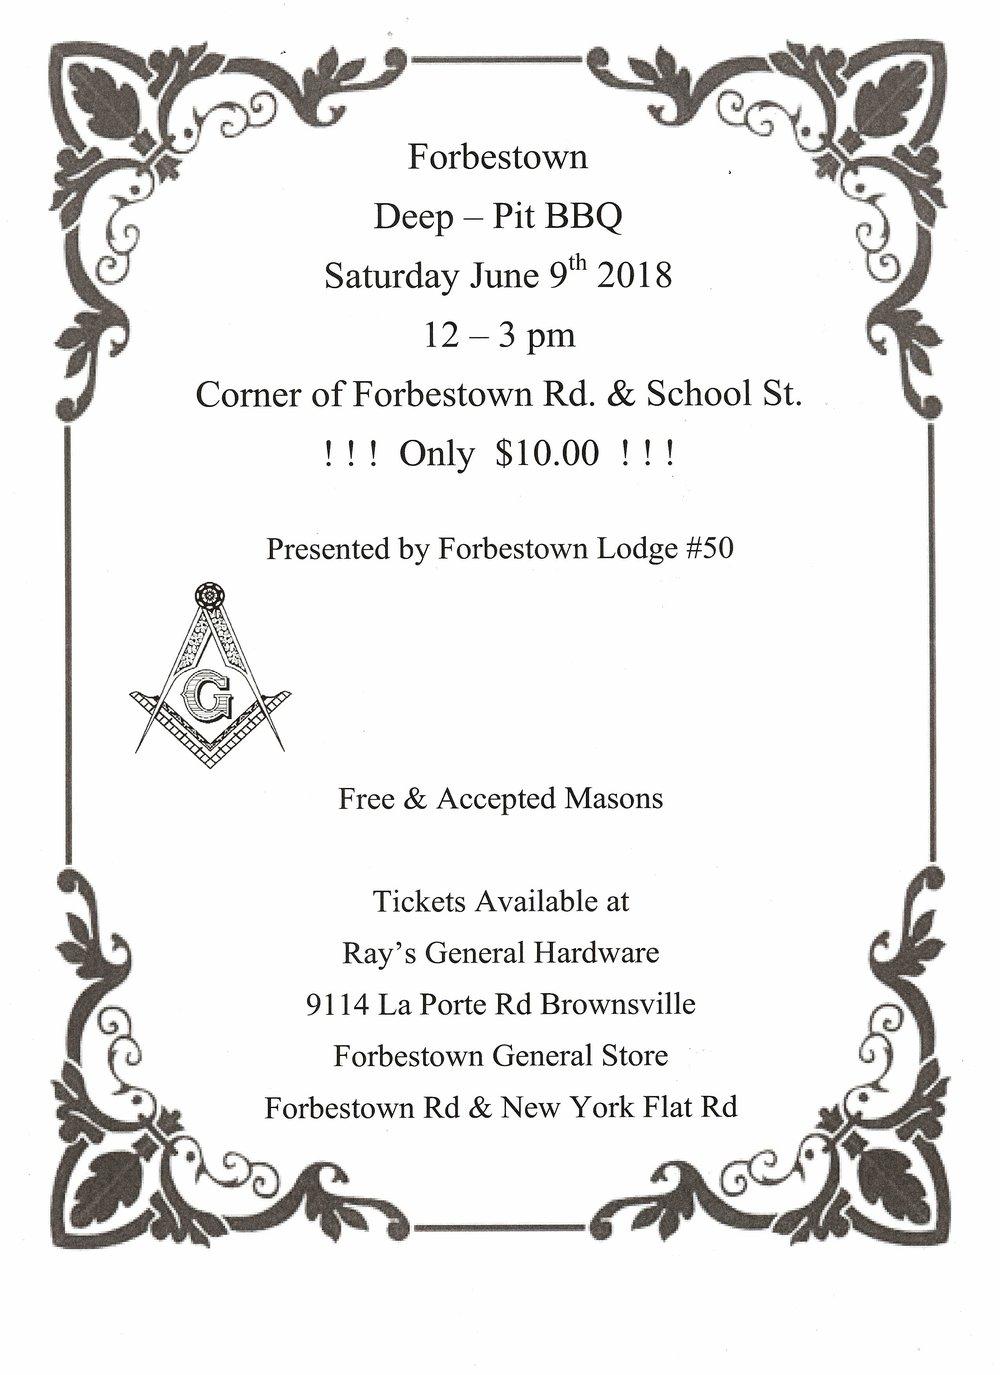 Forbestown Deep Pit Bar-B-Q.jpg